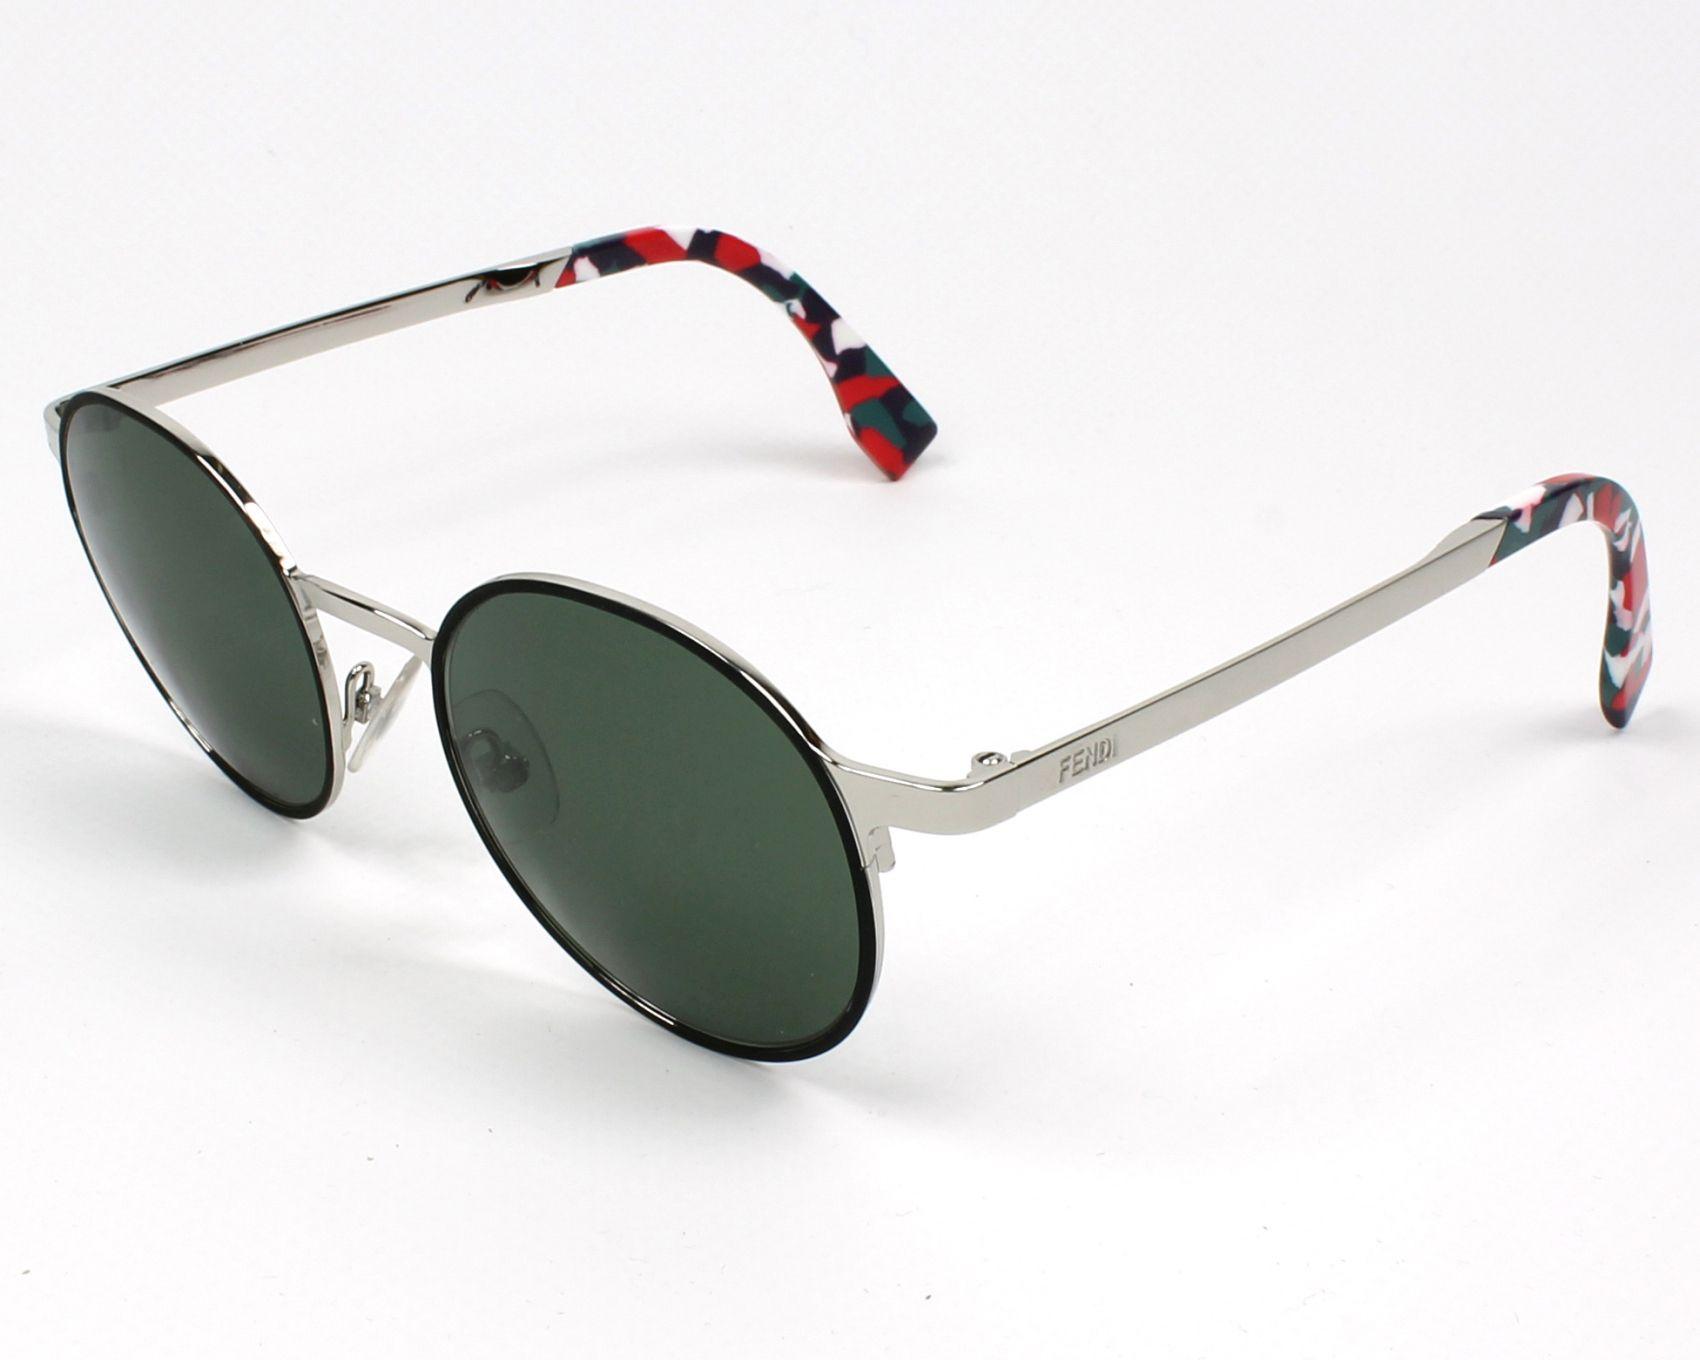 61e5e4b0ba Gafas de sol Fendi FF-0090-S D4185 49-20 Plata Negra vista